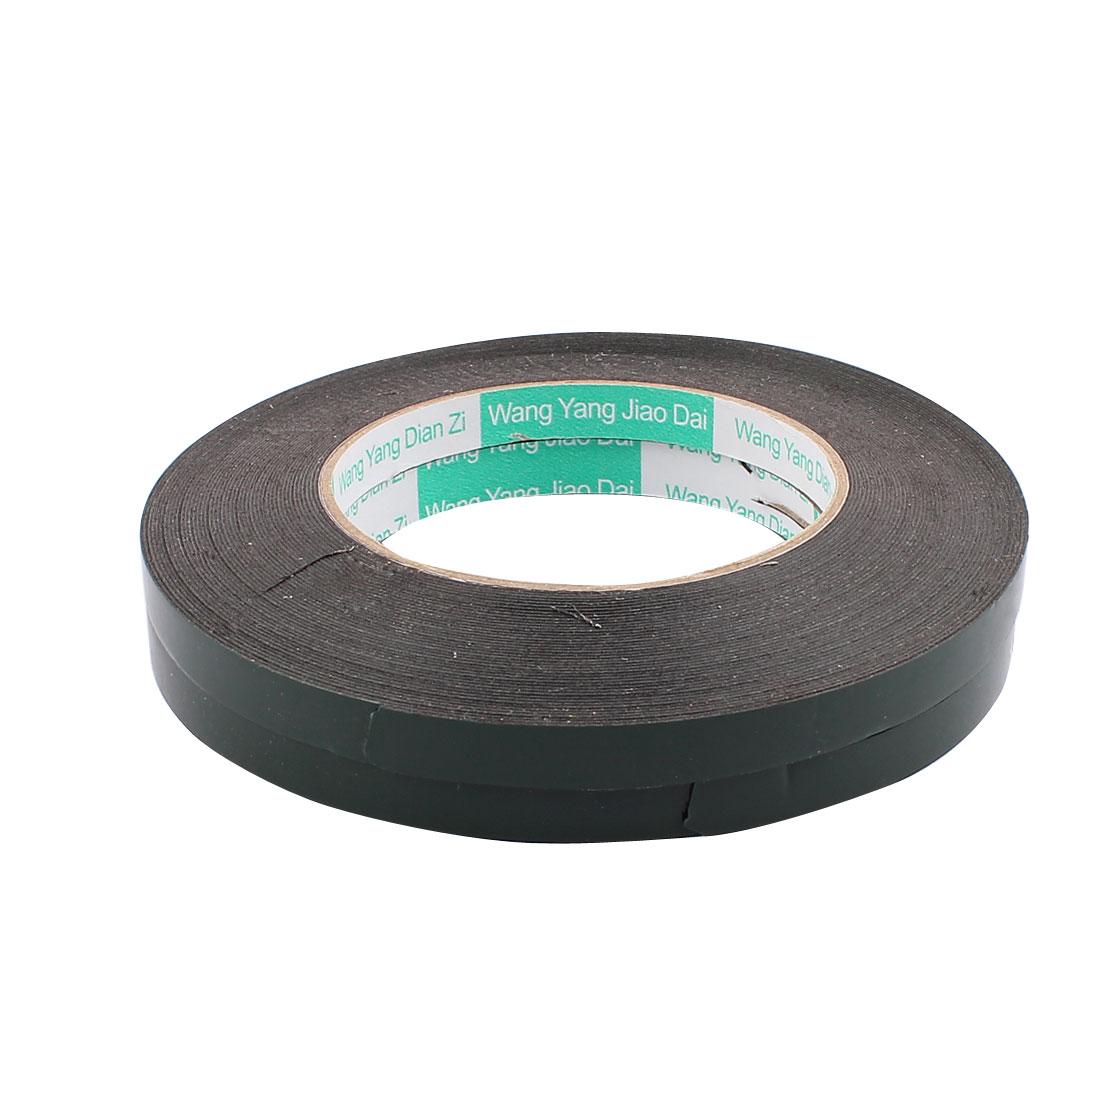 2 Pcs 1CM Width 15M Length 0.5MM Thick Dual Sided Sealing Shockproof Sponge Tape